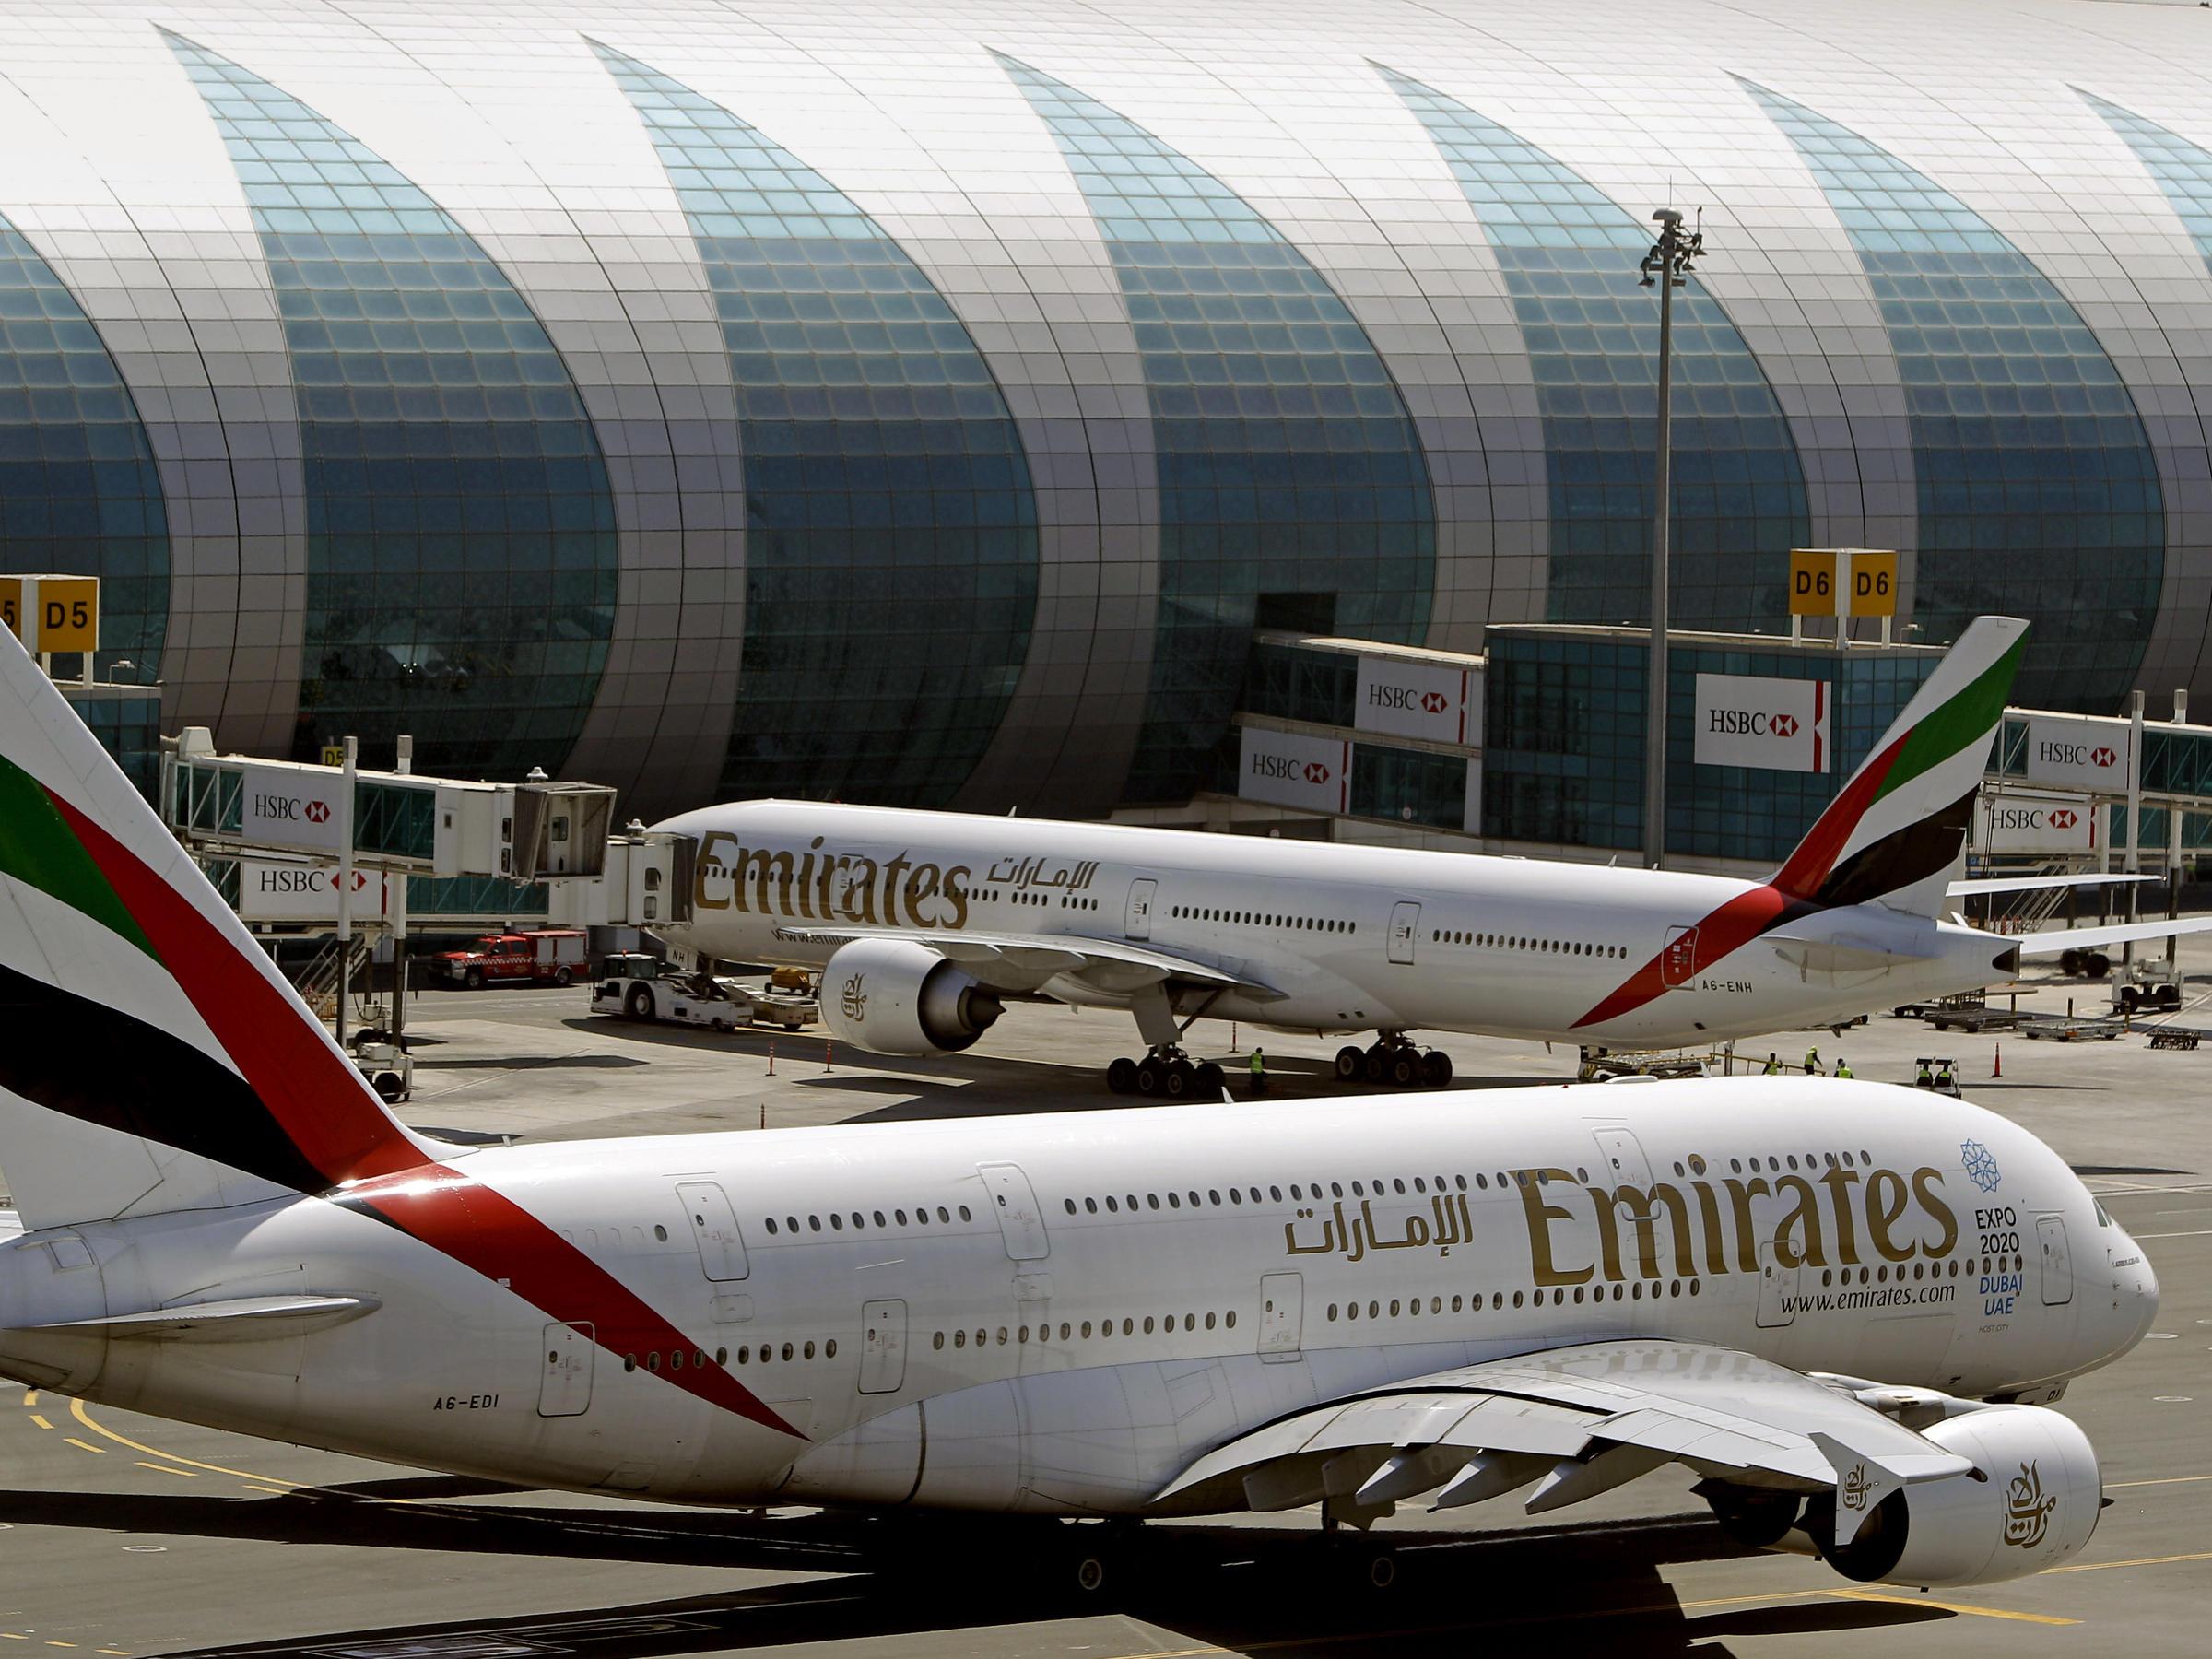 U.S. lifts laptop ban for Etihad flights